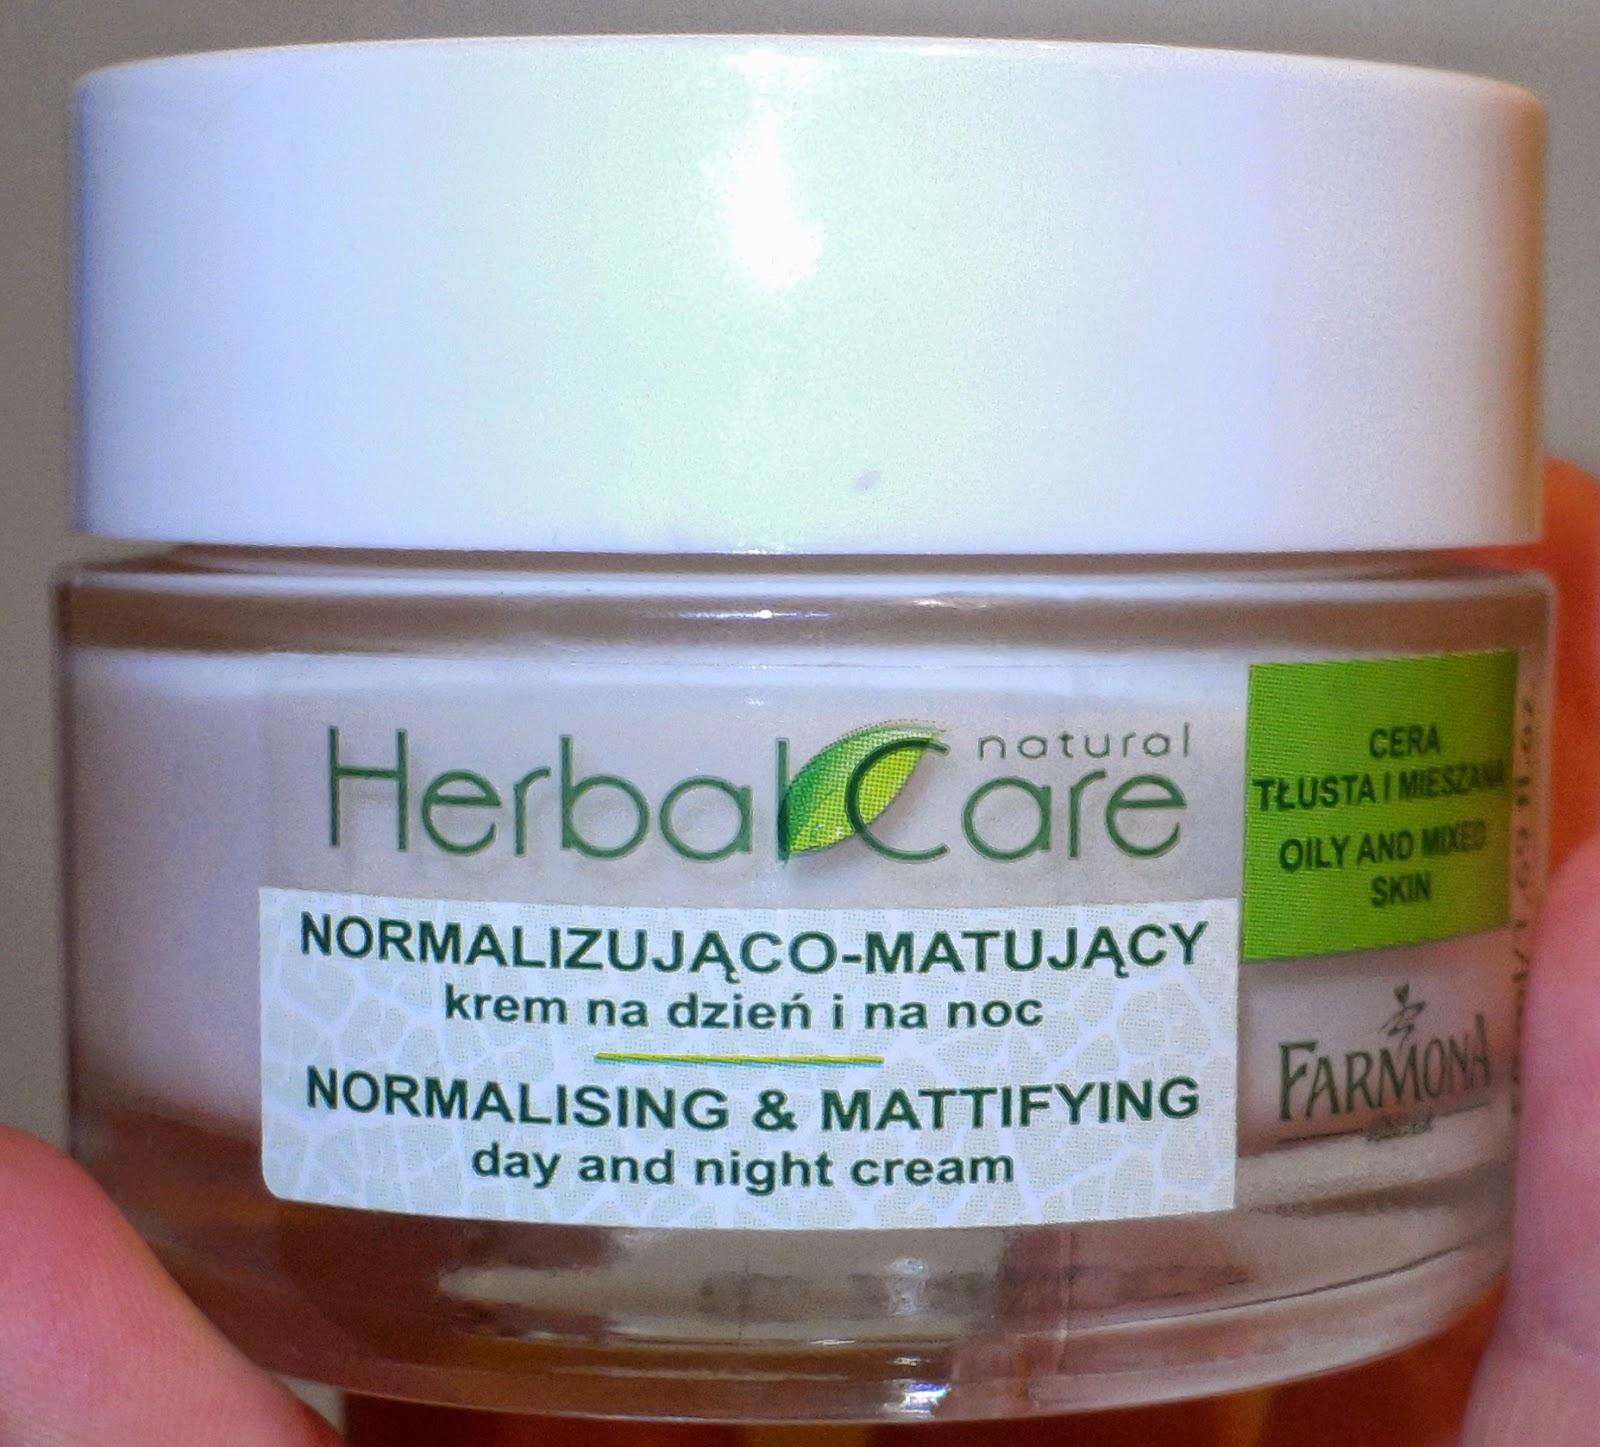 herbal care farmona